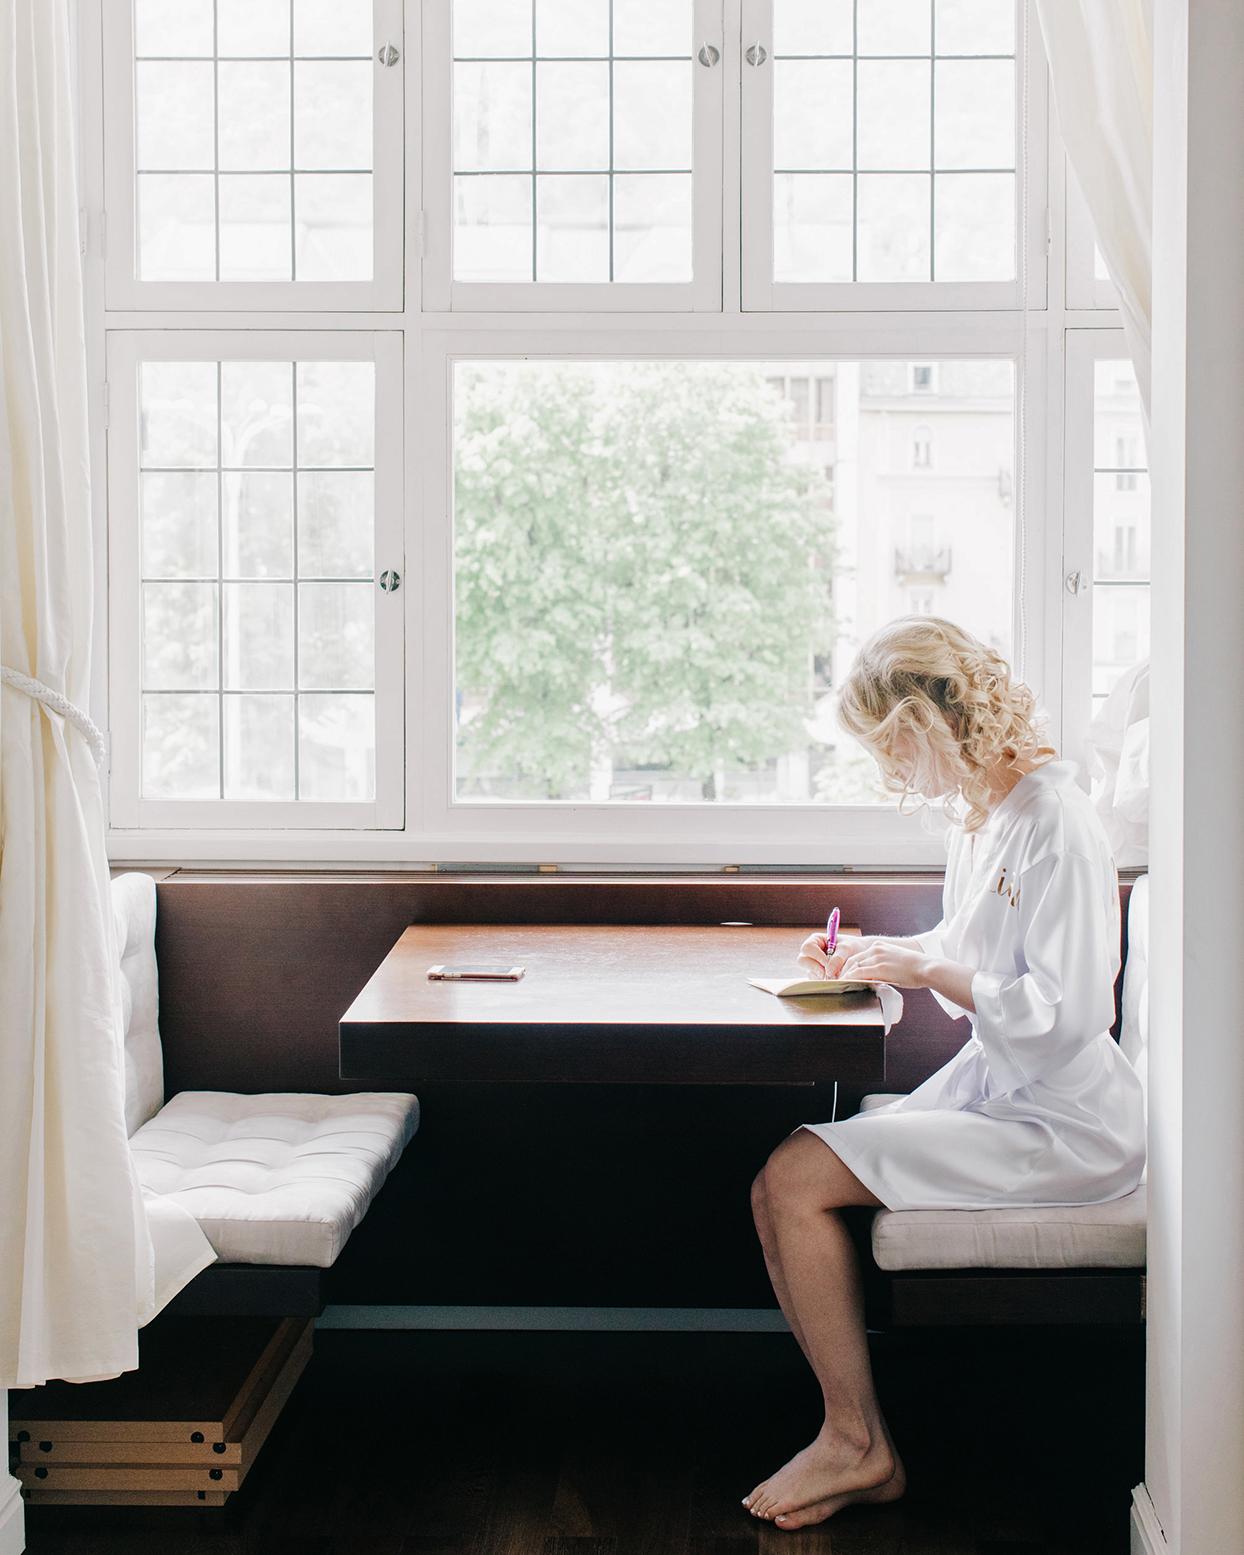 kiira arthur wedding bride writing vows by window